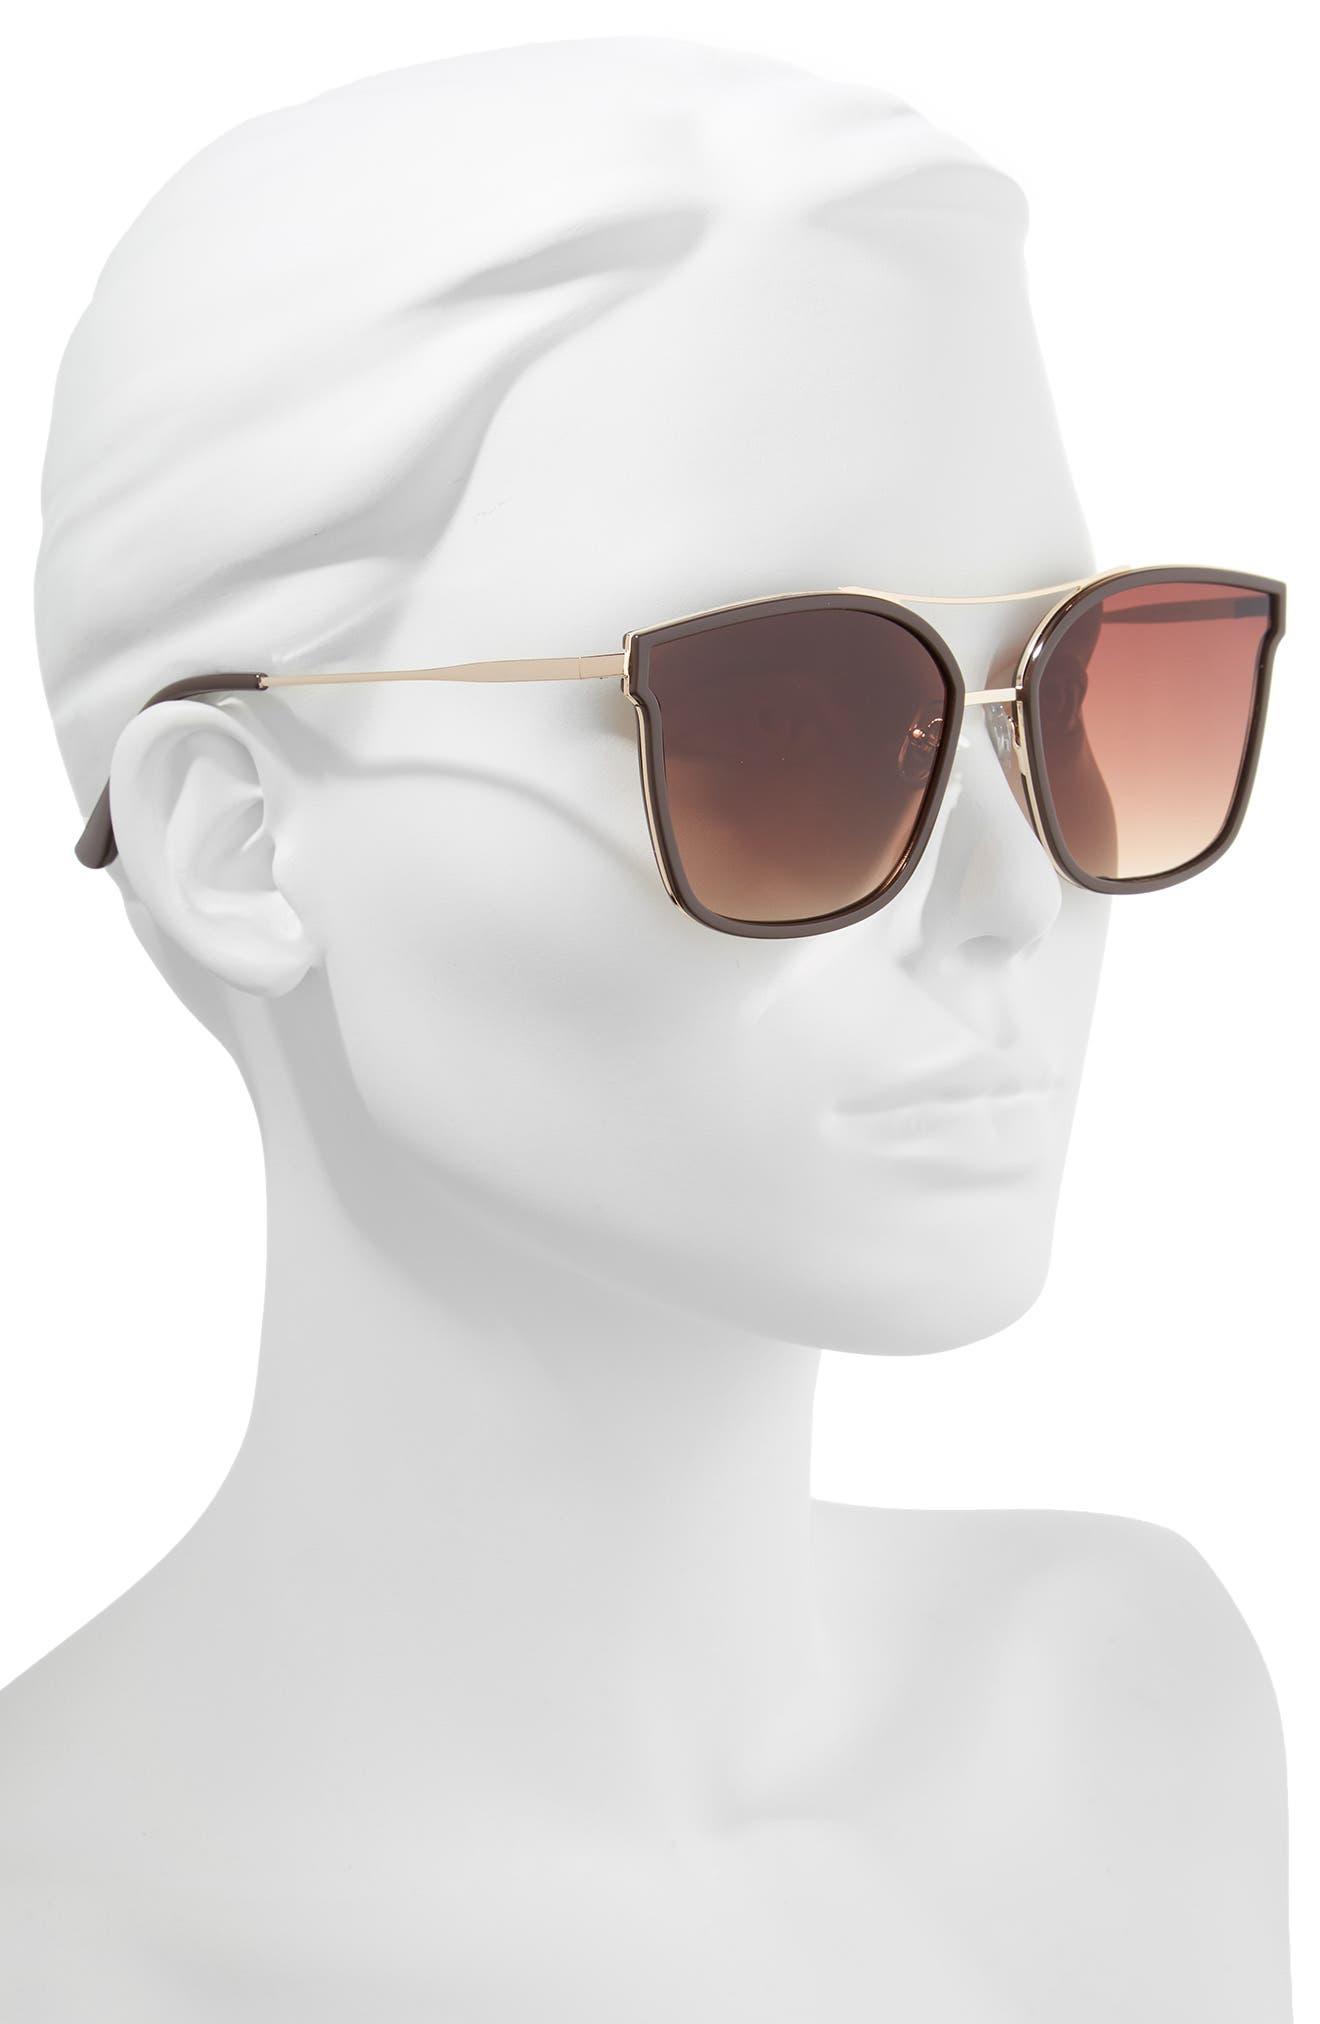 60mm Cat Eye Sunglasses,                             Alternate thumbnail 2, color,                             Gold/ Brown